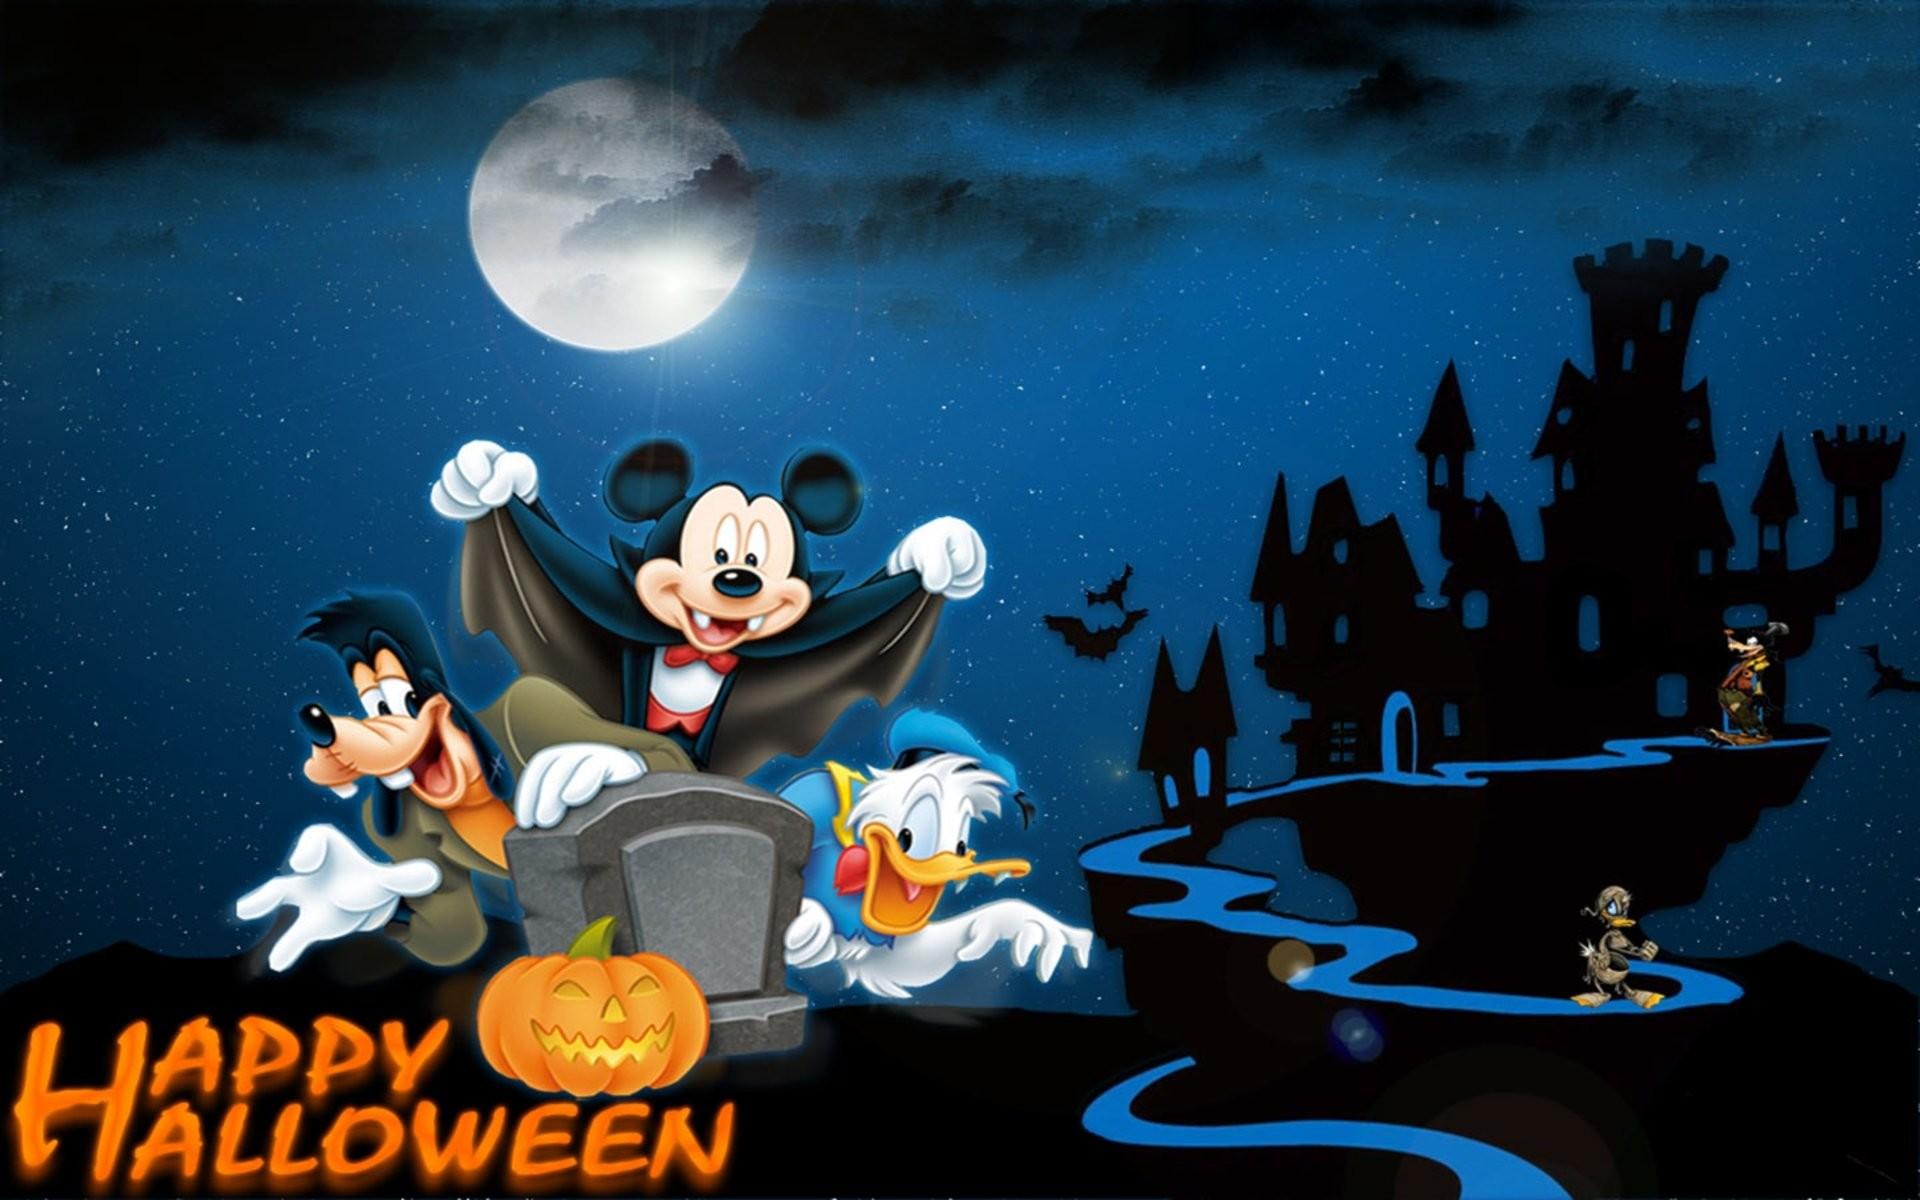 Disney Halloween Wallpaper Backgrounds ① Wallpapertag